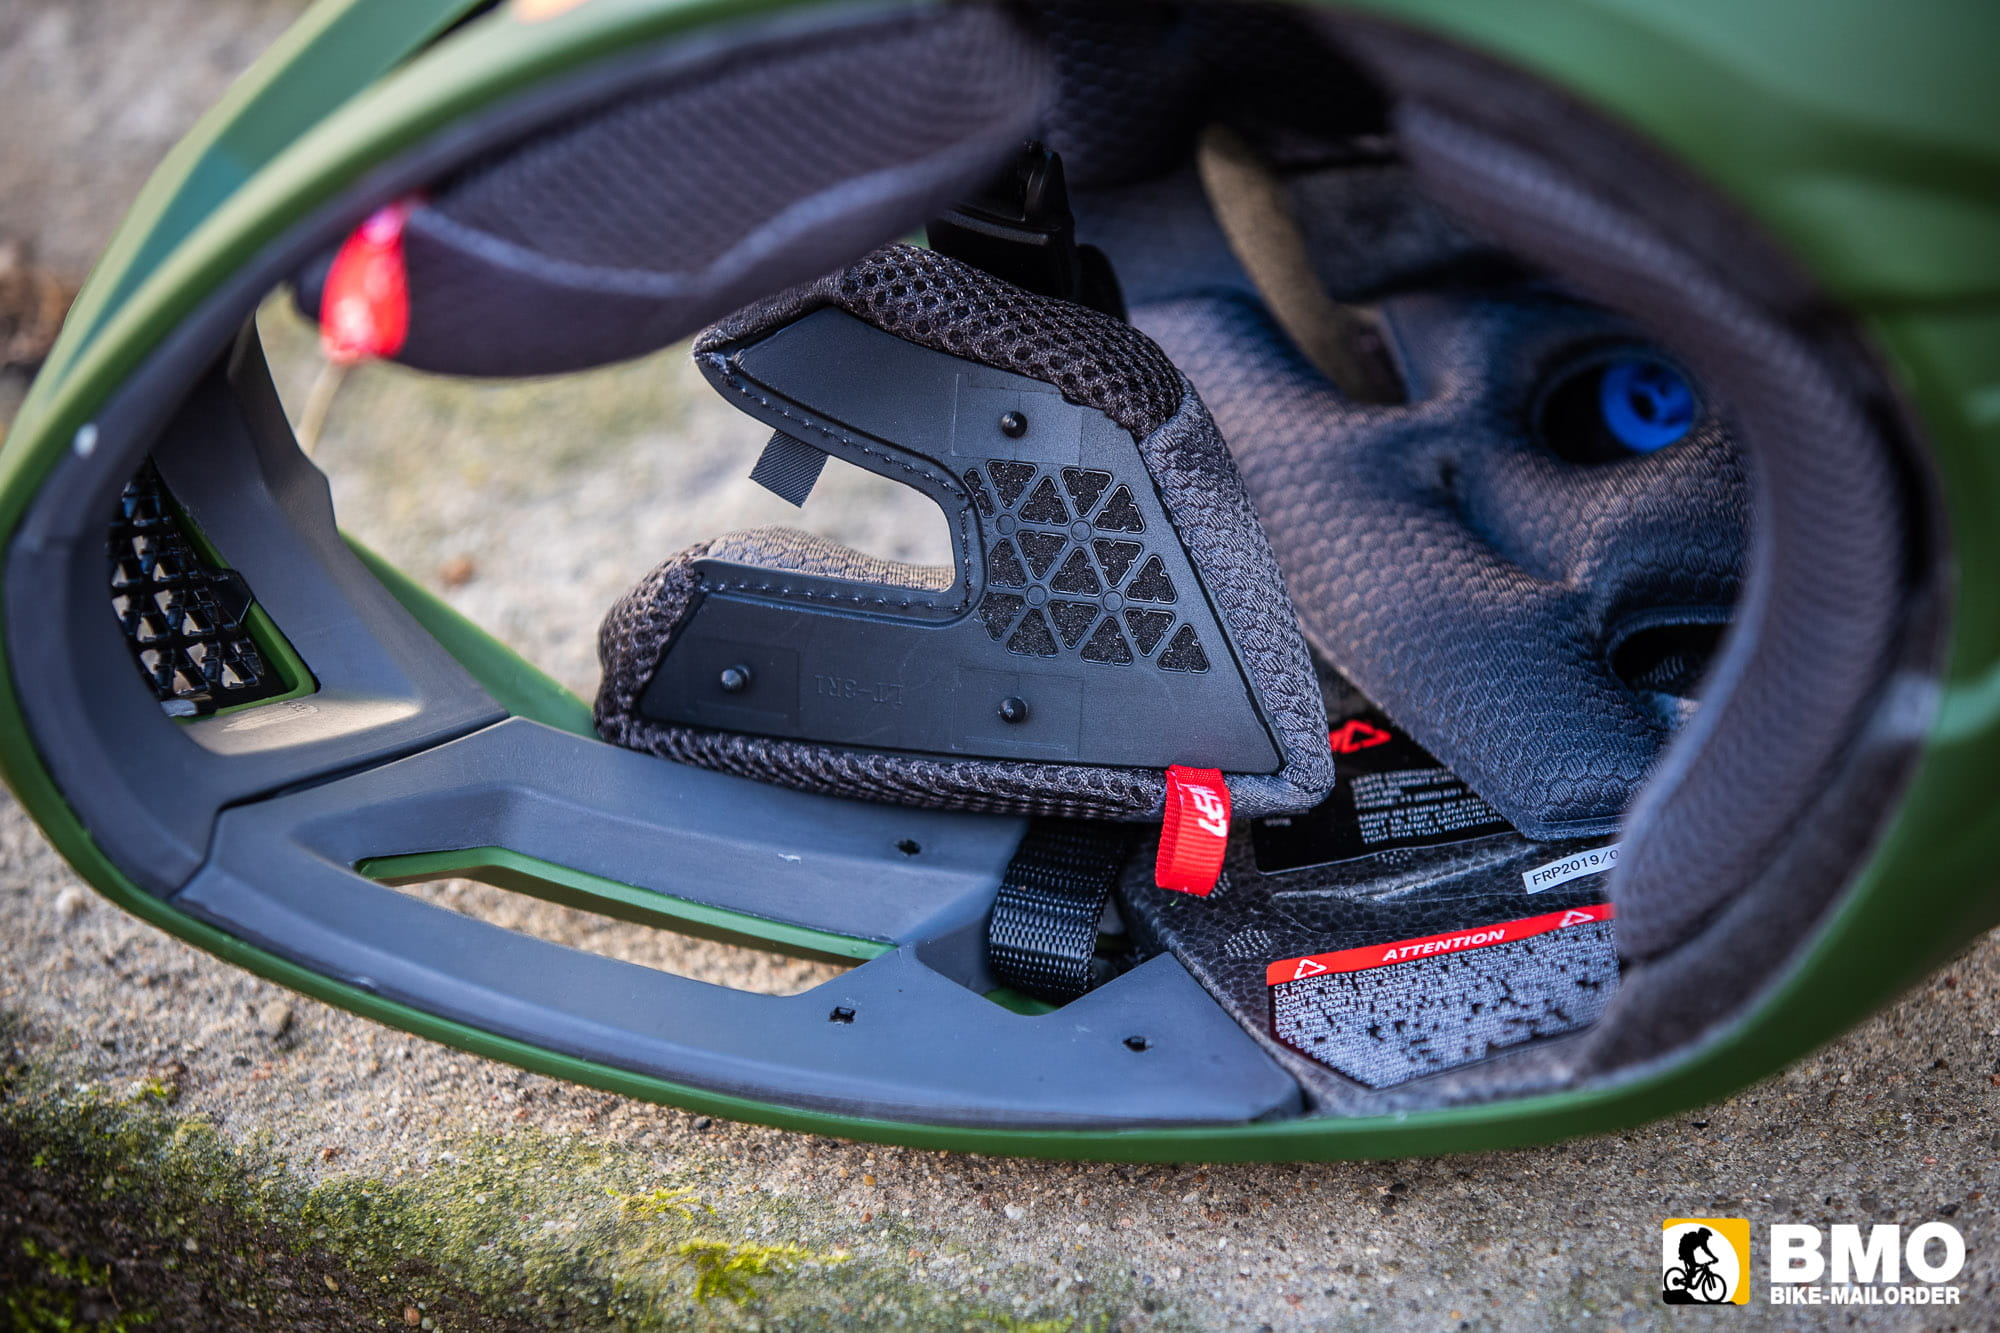 Leatt-DBX-4-0-Super-Ventilated-Fullface-Helm-Bike-Mailorder-11